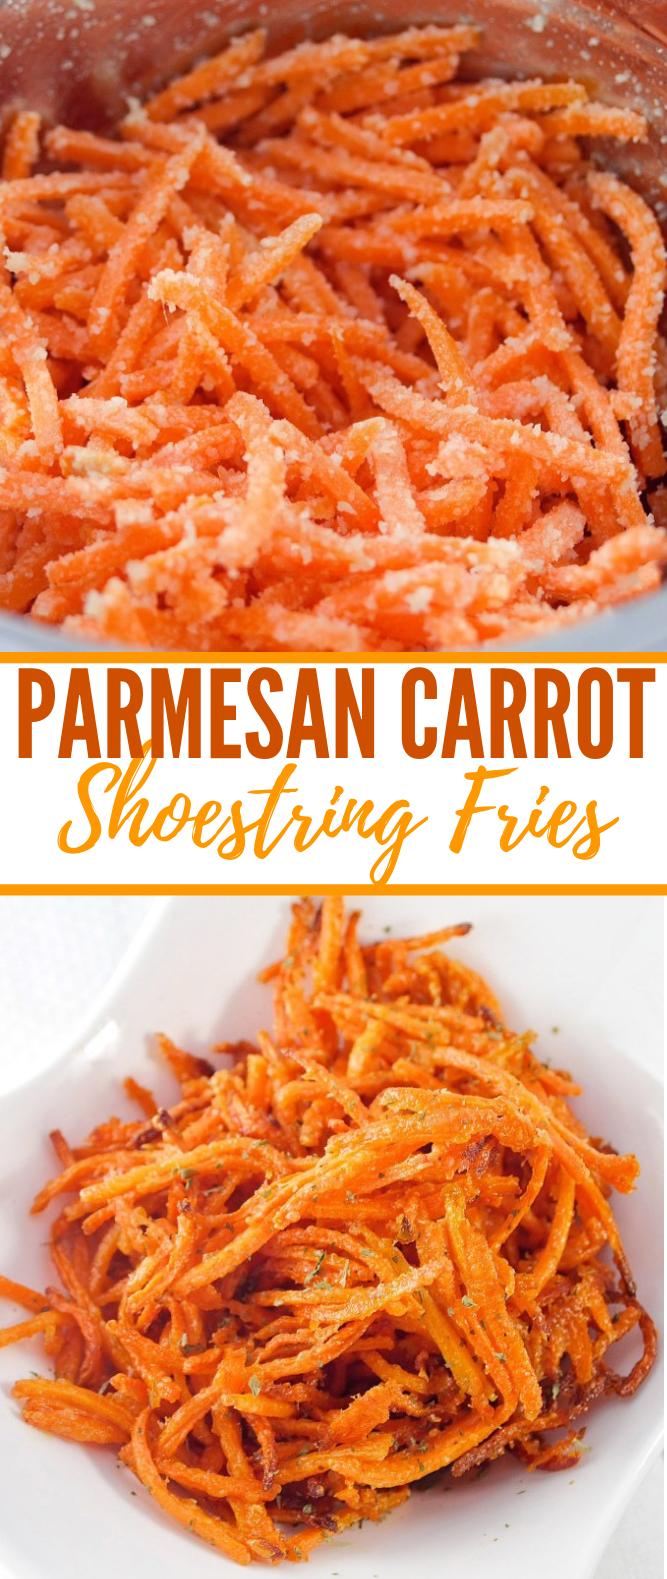 Parmesan Carrot Shoestring Fries #vegetarian #snacks